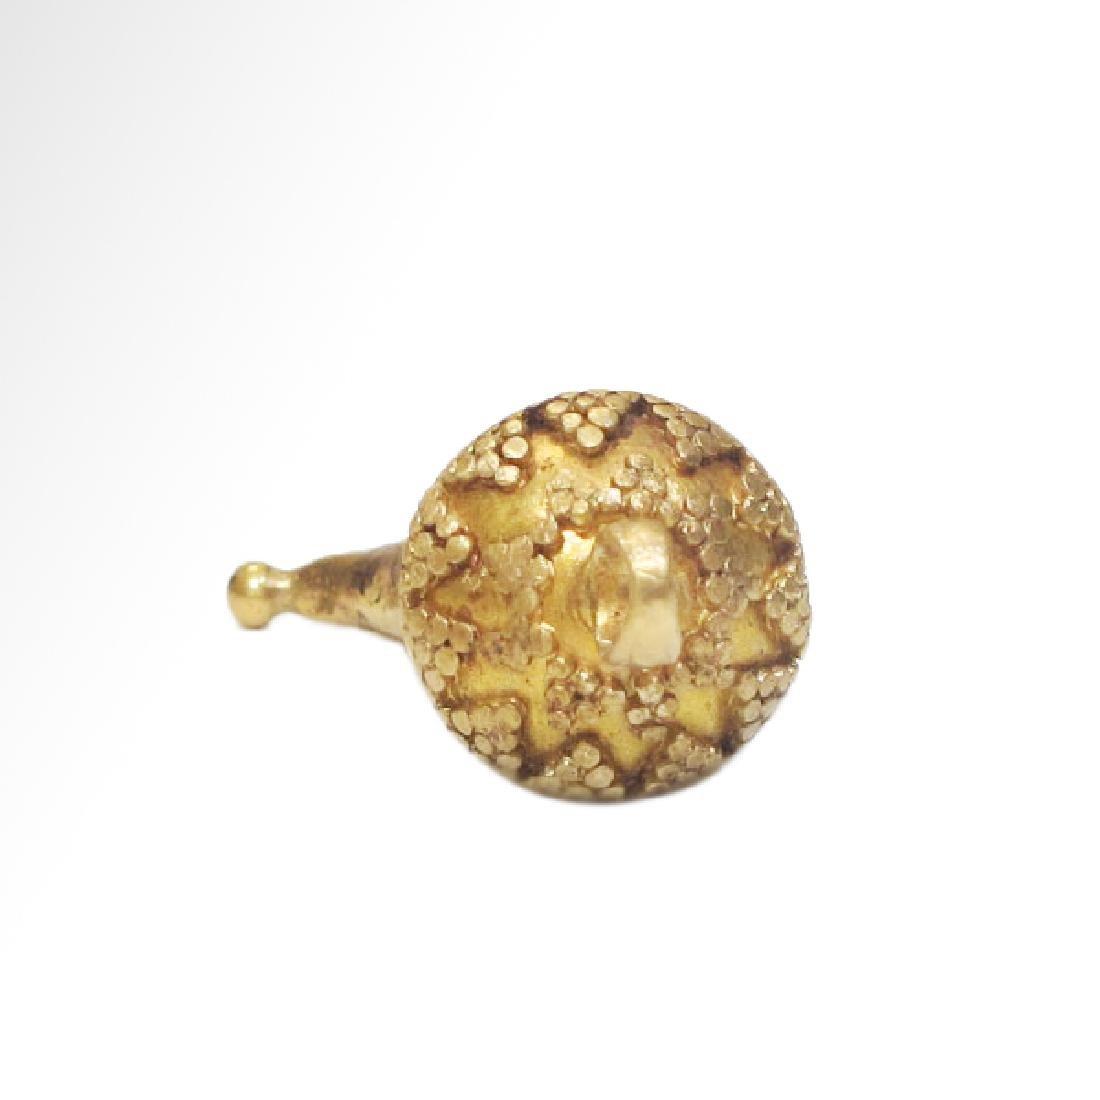 Roman Gold Pendant, Cornucopia, c. 2nd Century A.D. - 6